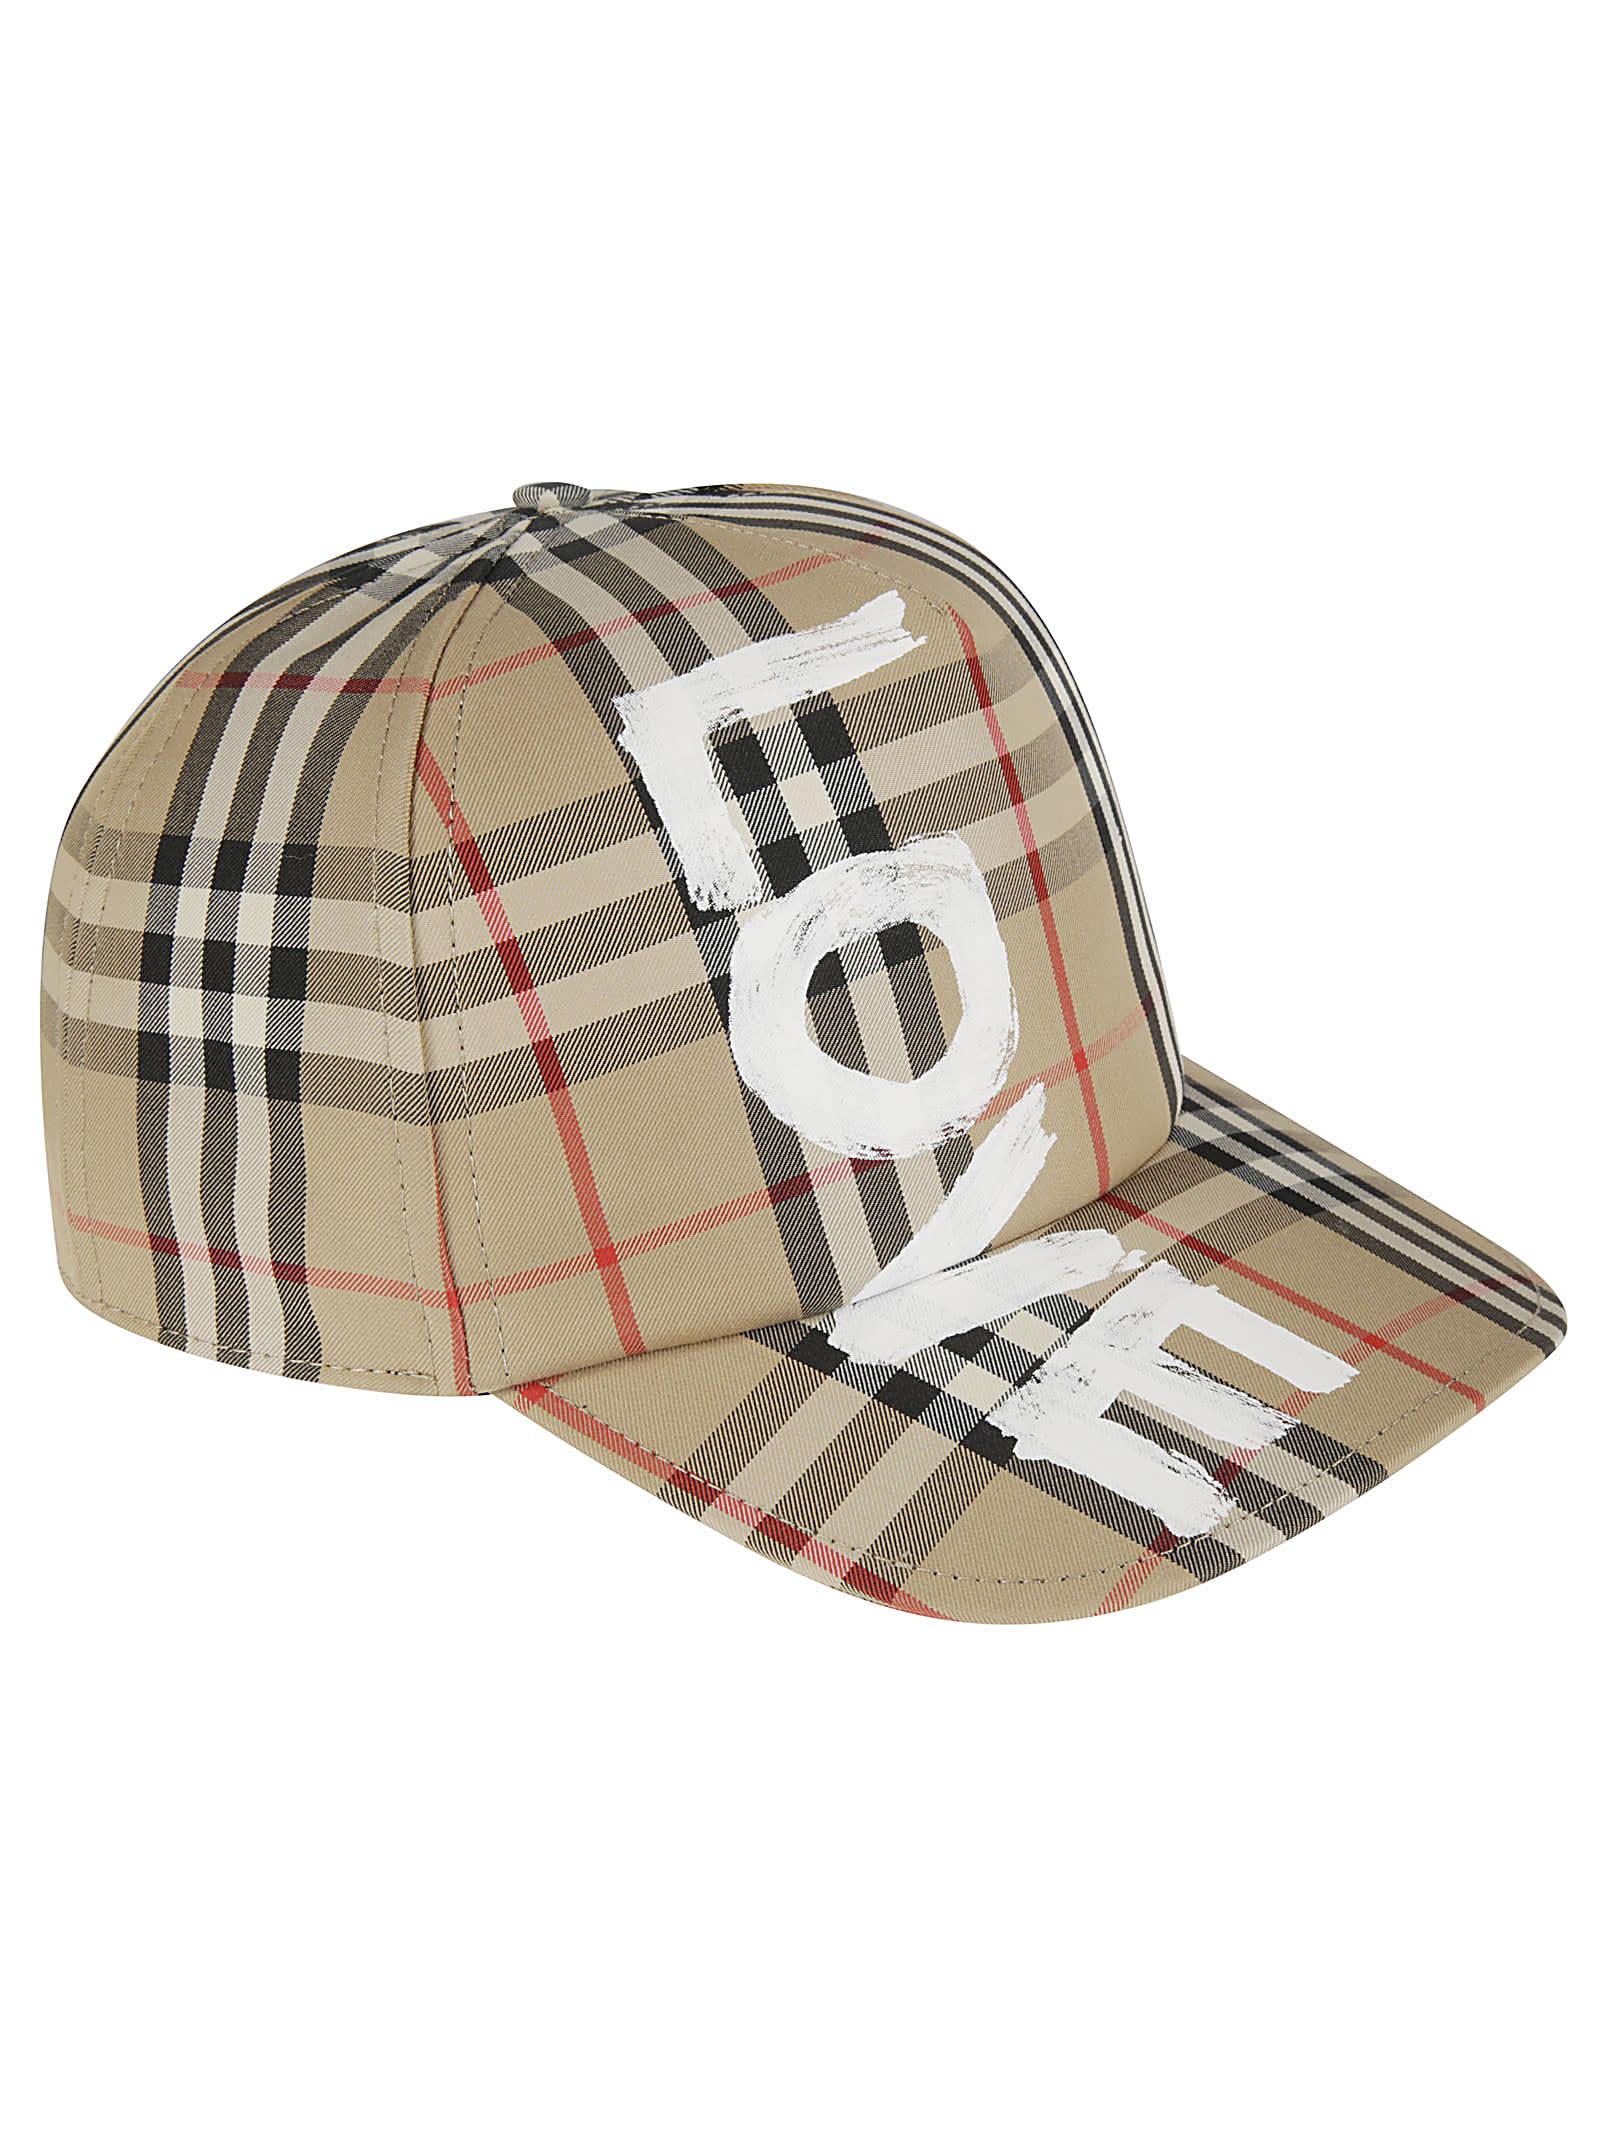 Burberry Caps LOVE PIGMENTED SCREEN PRINT TRUCKER HAT